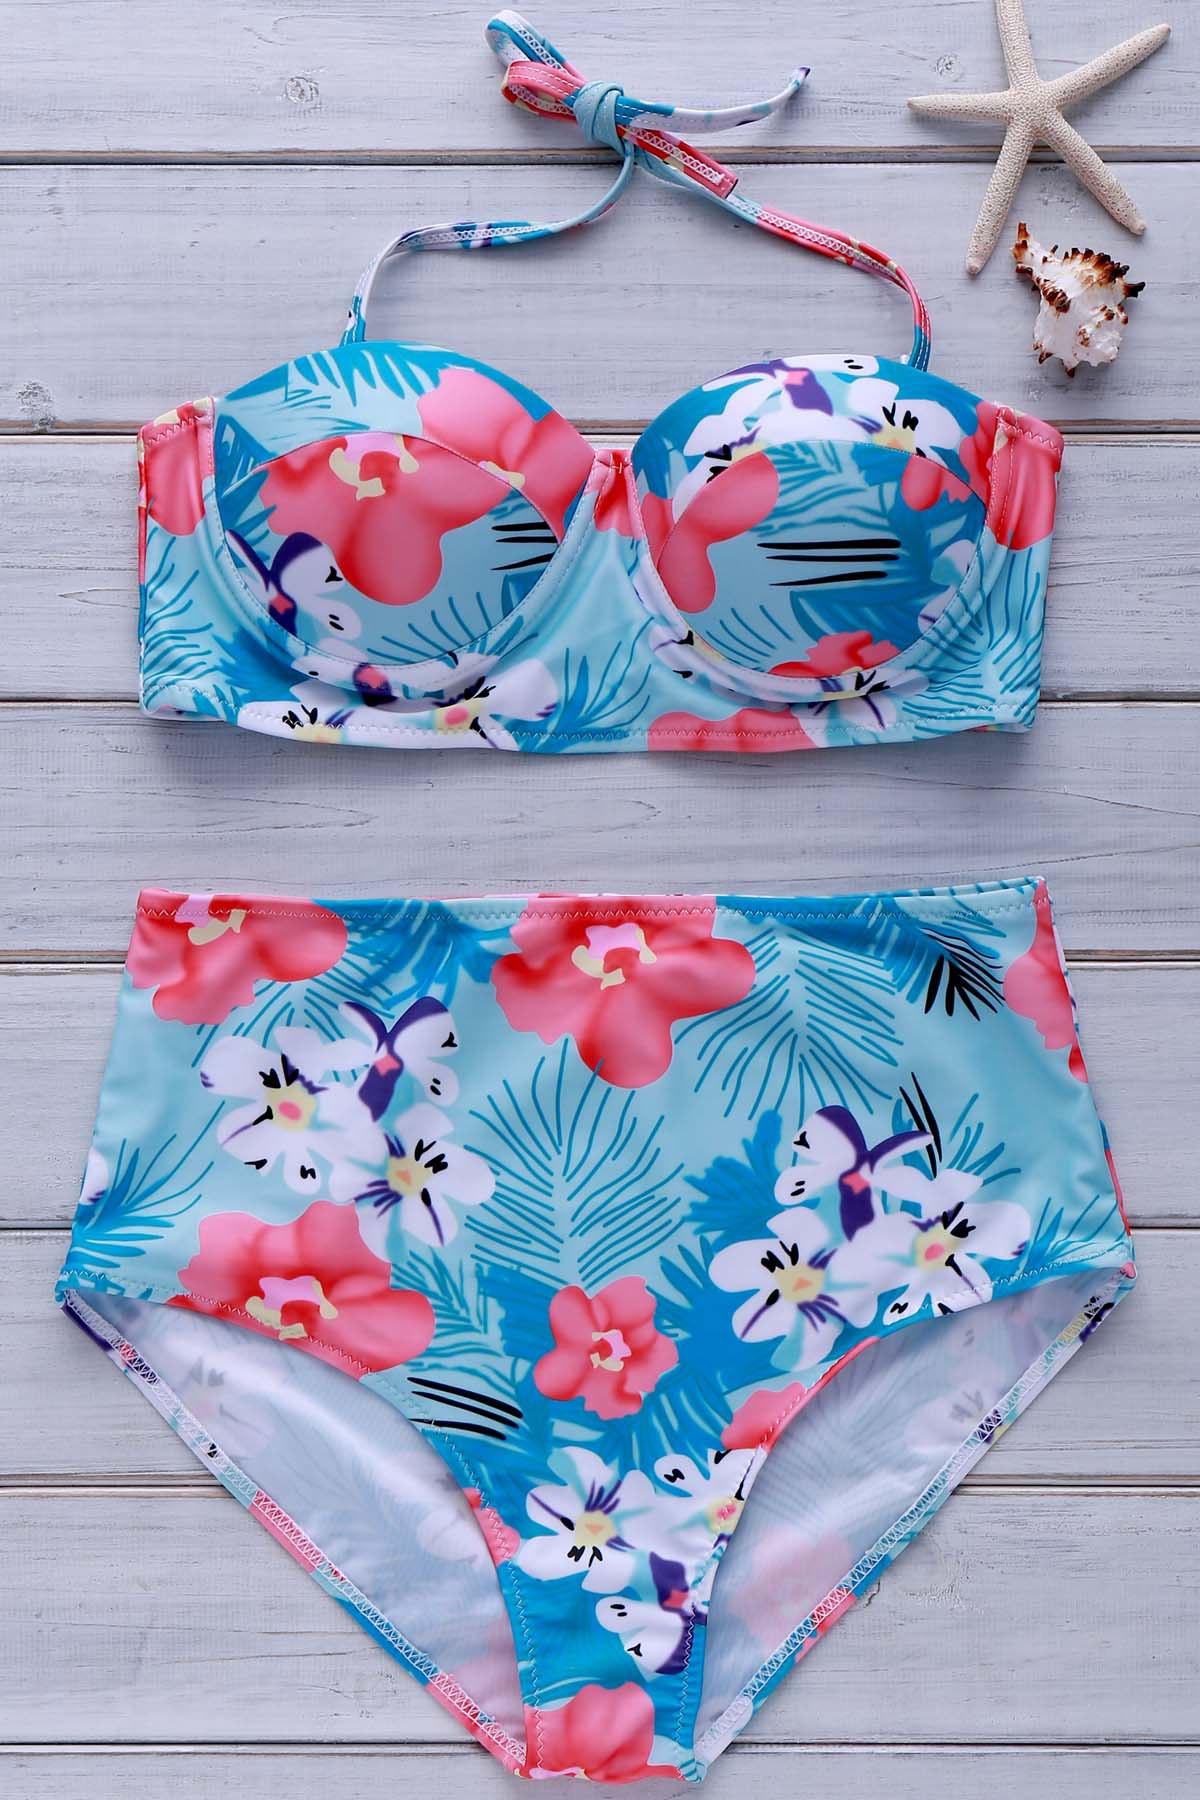 Halter Tropical Print High-Waisted Bikini Set